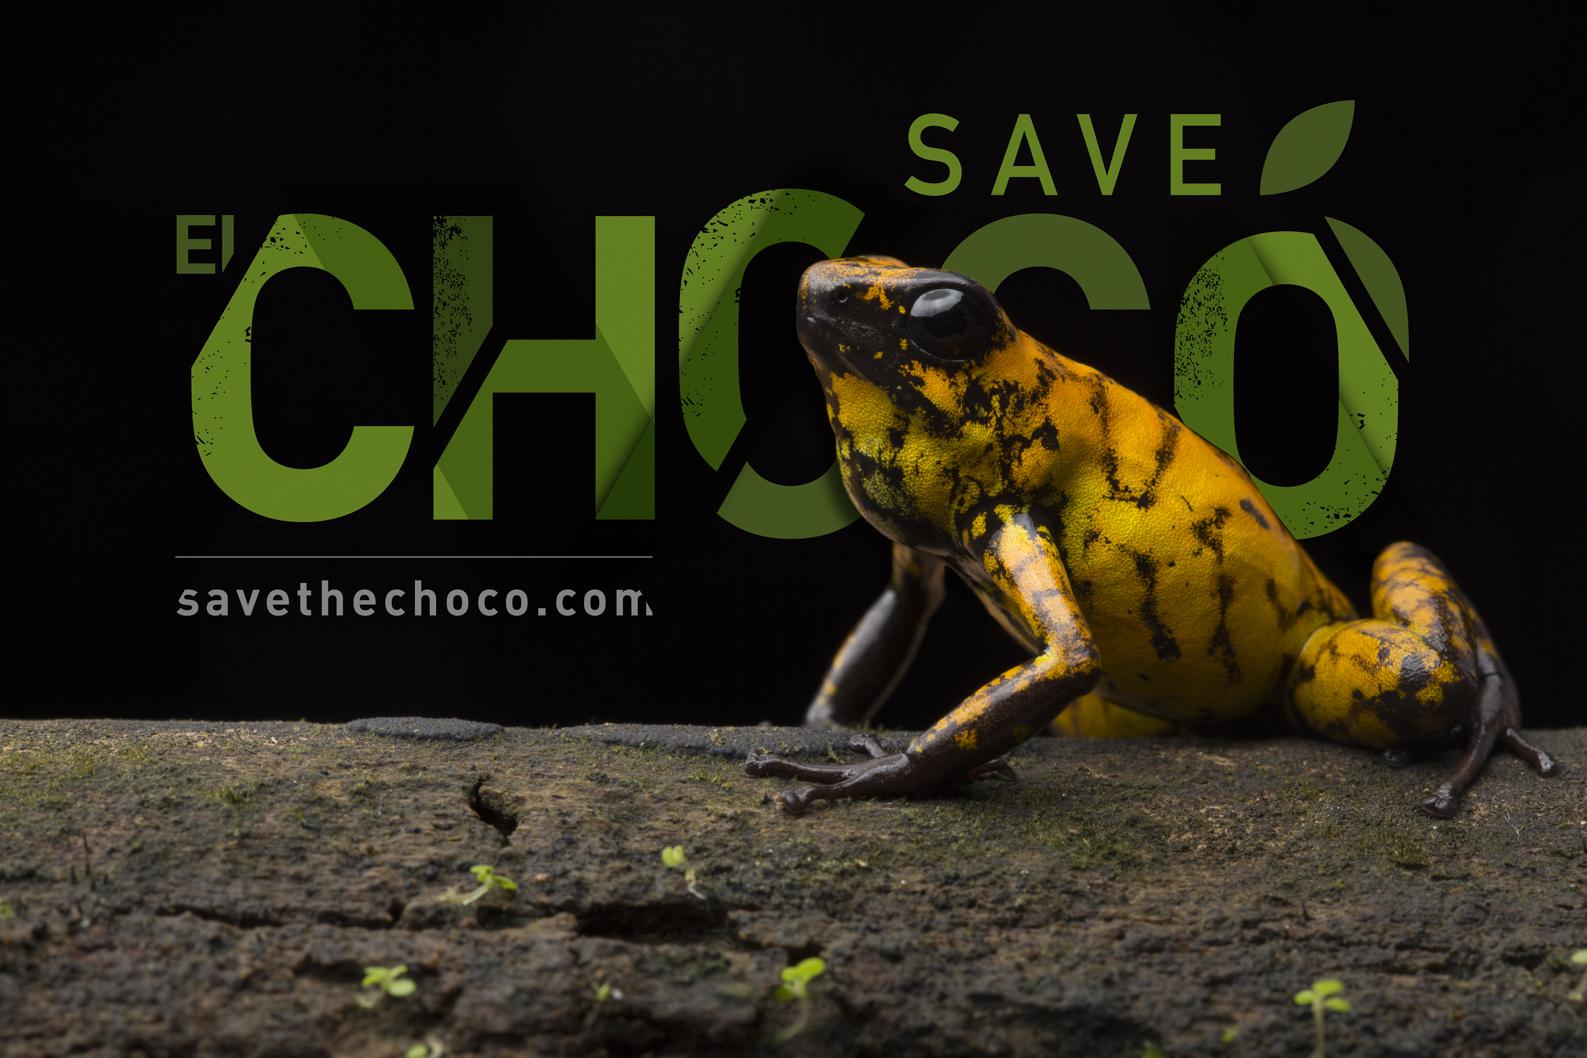 SAVETHECHOCO_FLICKR.COM